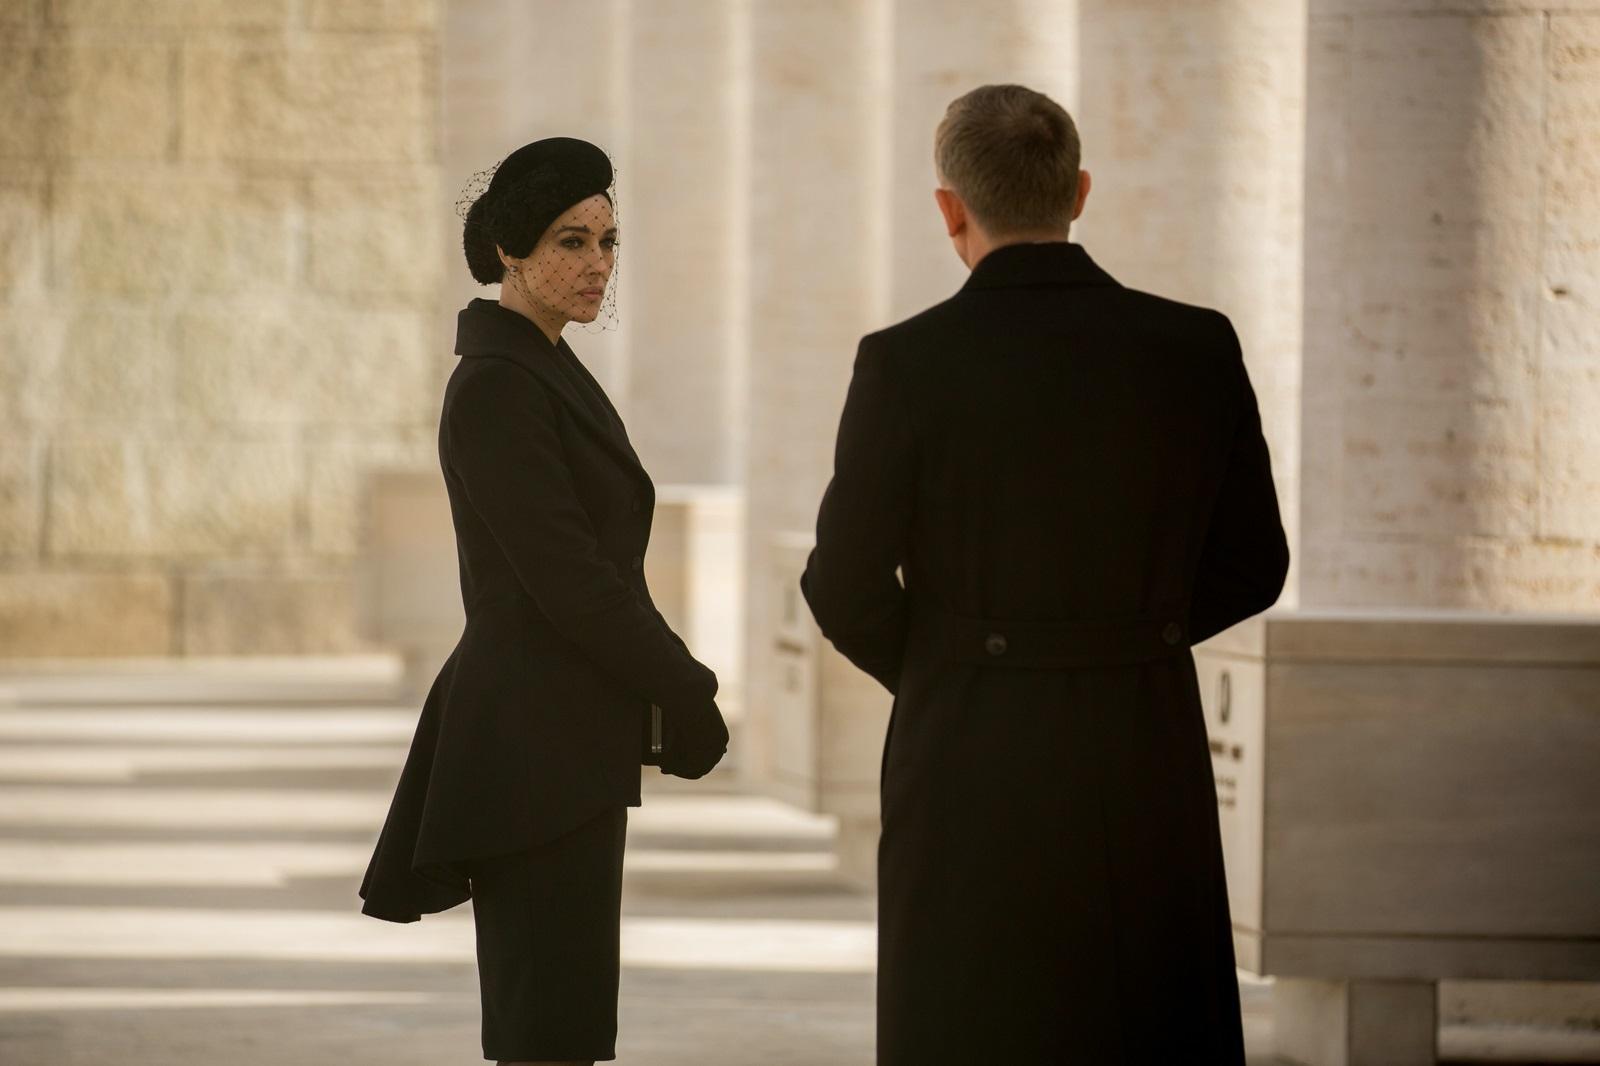 007 спектр spectre 2015 отзывы кадры из - кино